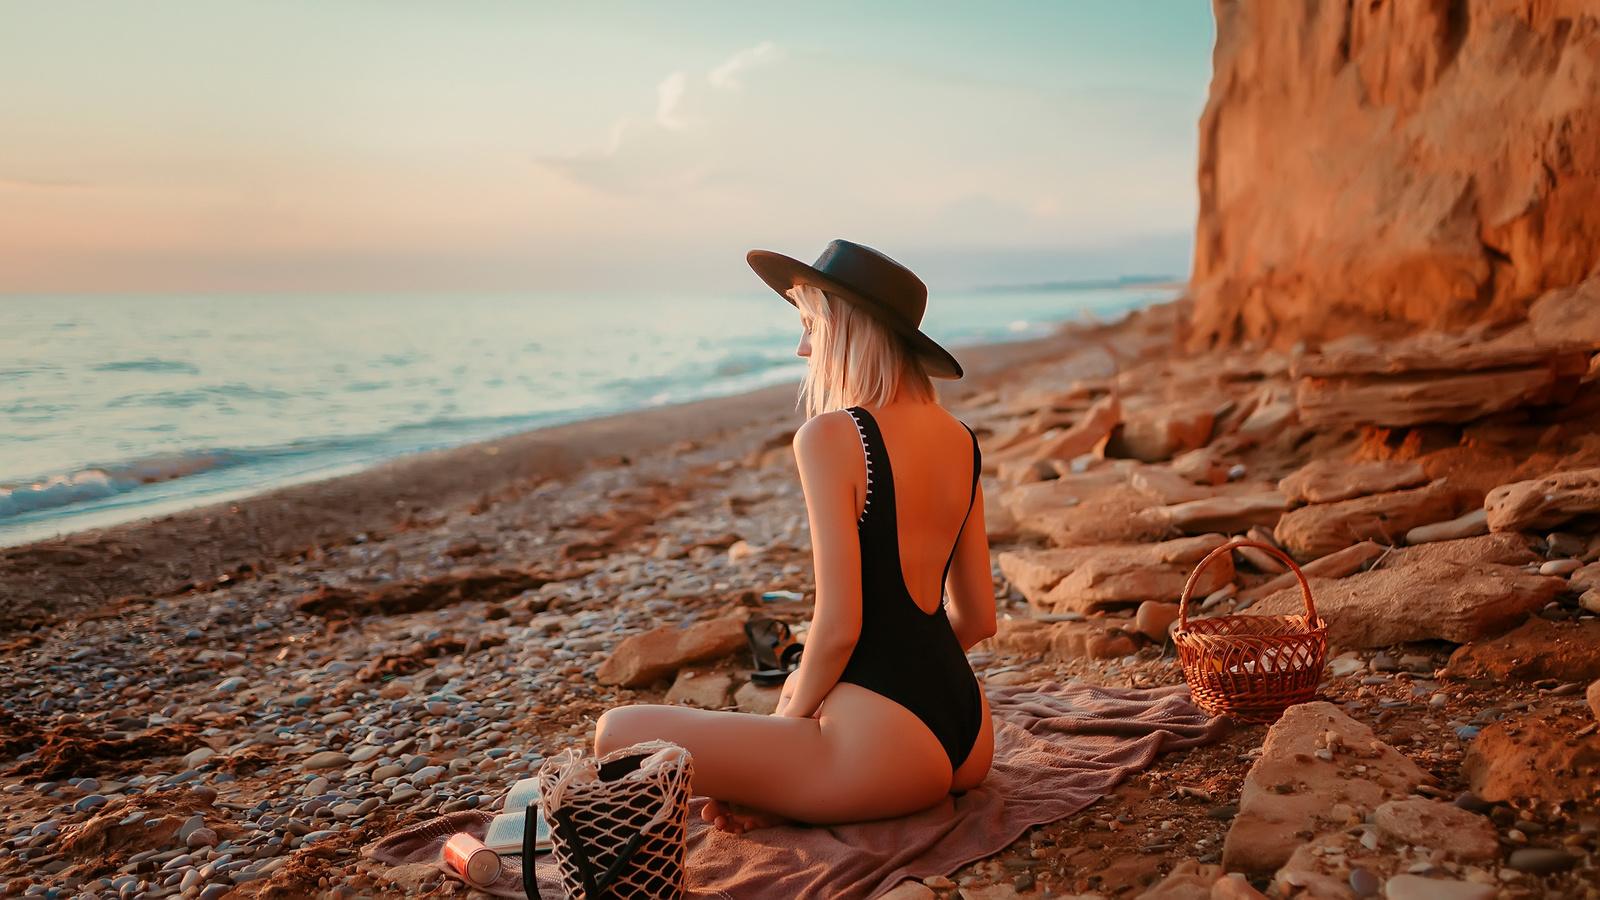 women, blonde, brunette, one-piece swimsuit, ass, sunset, sea, beach, women outdoors, black swimsuit, coca-cola, hat, books, sitting